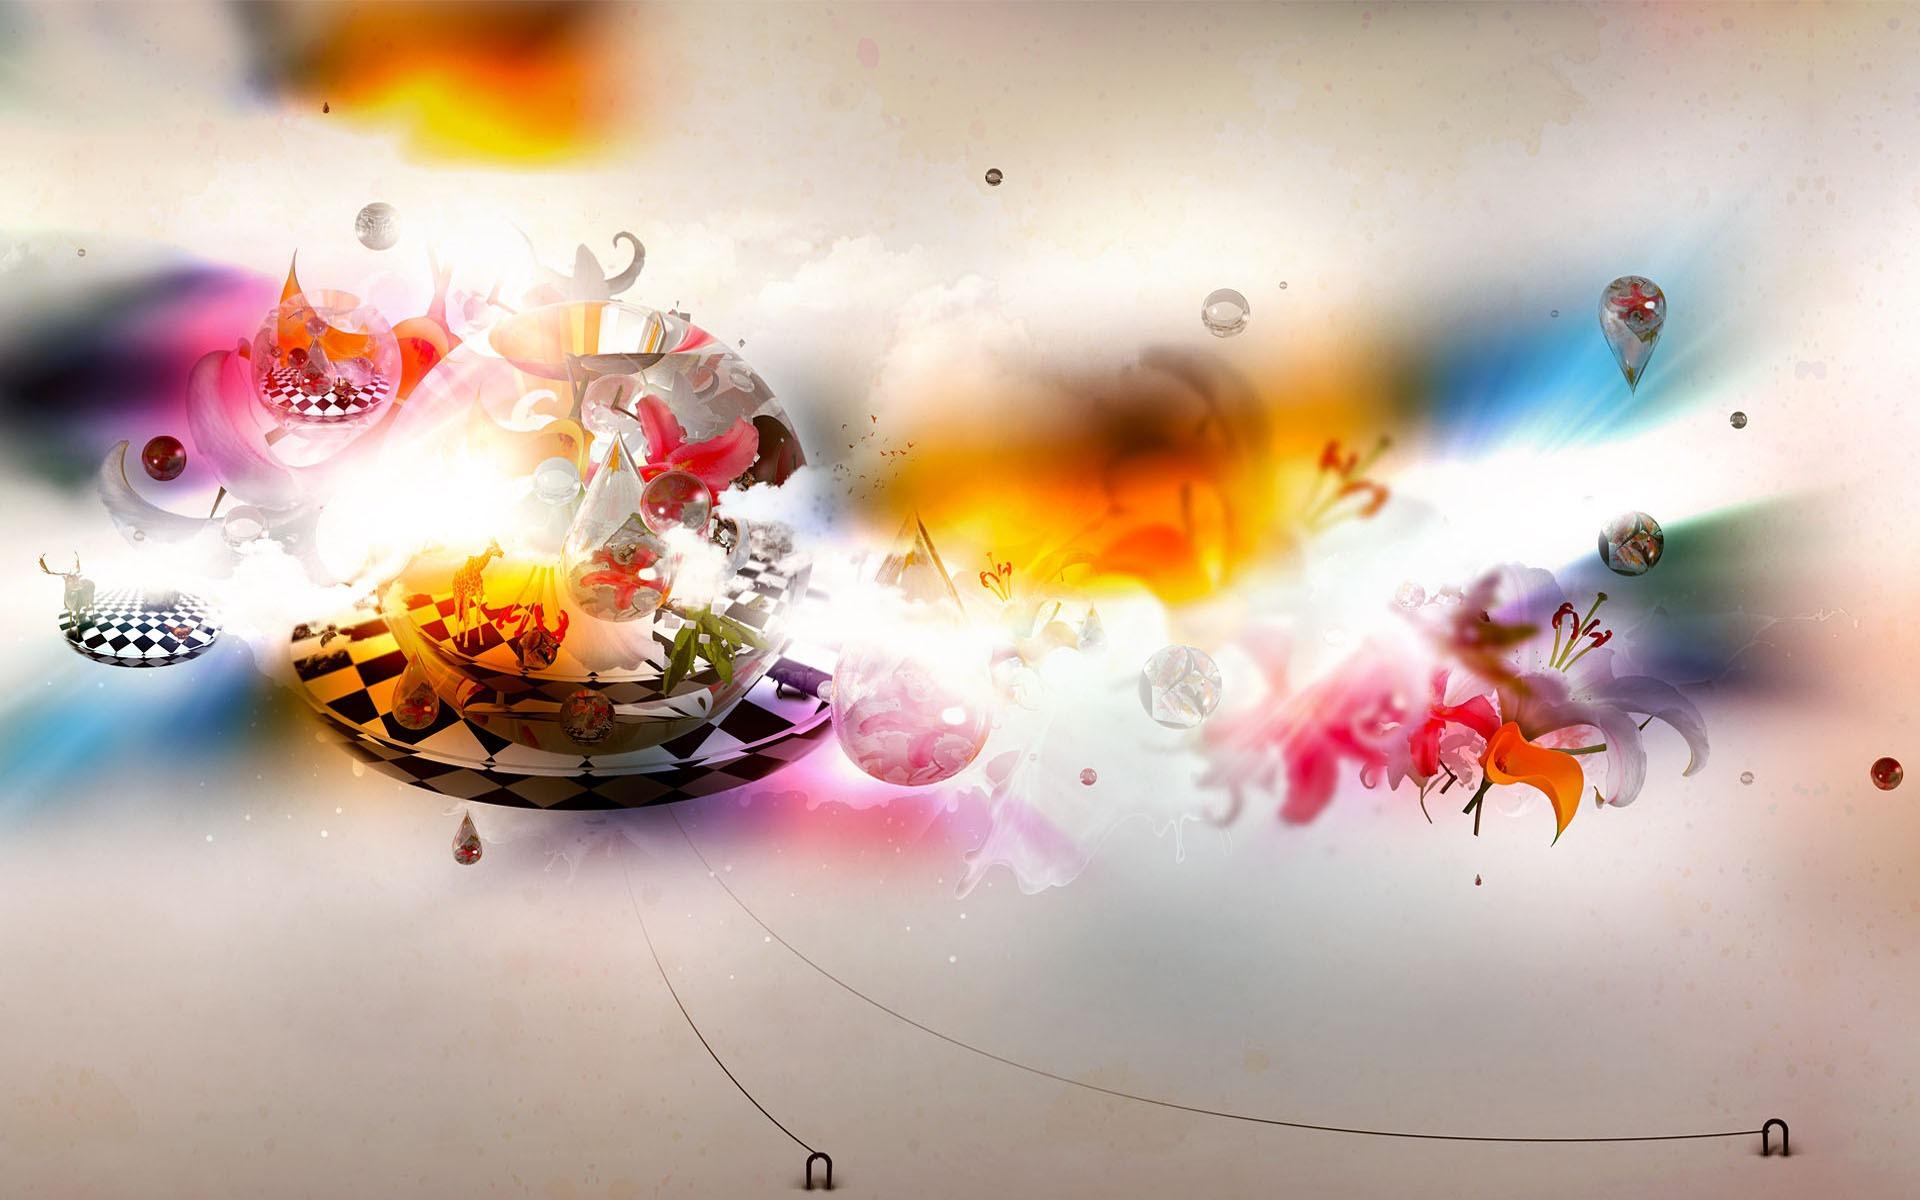 Abstract Wallpaper For Desktop